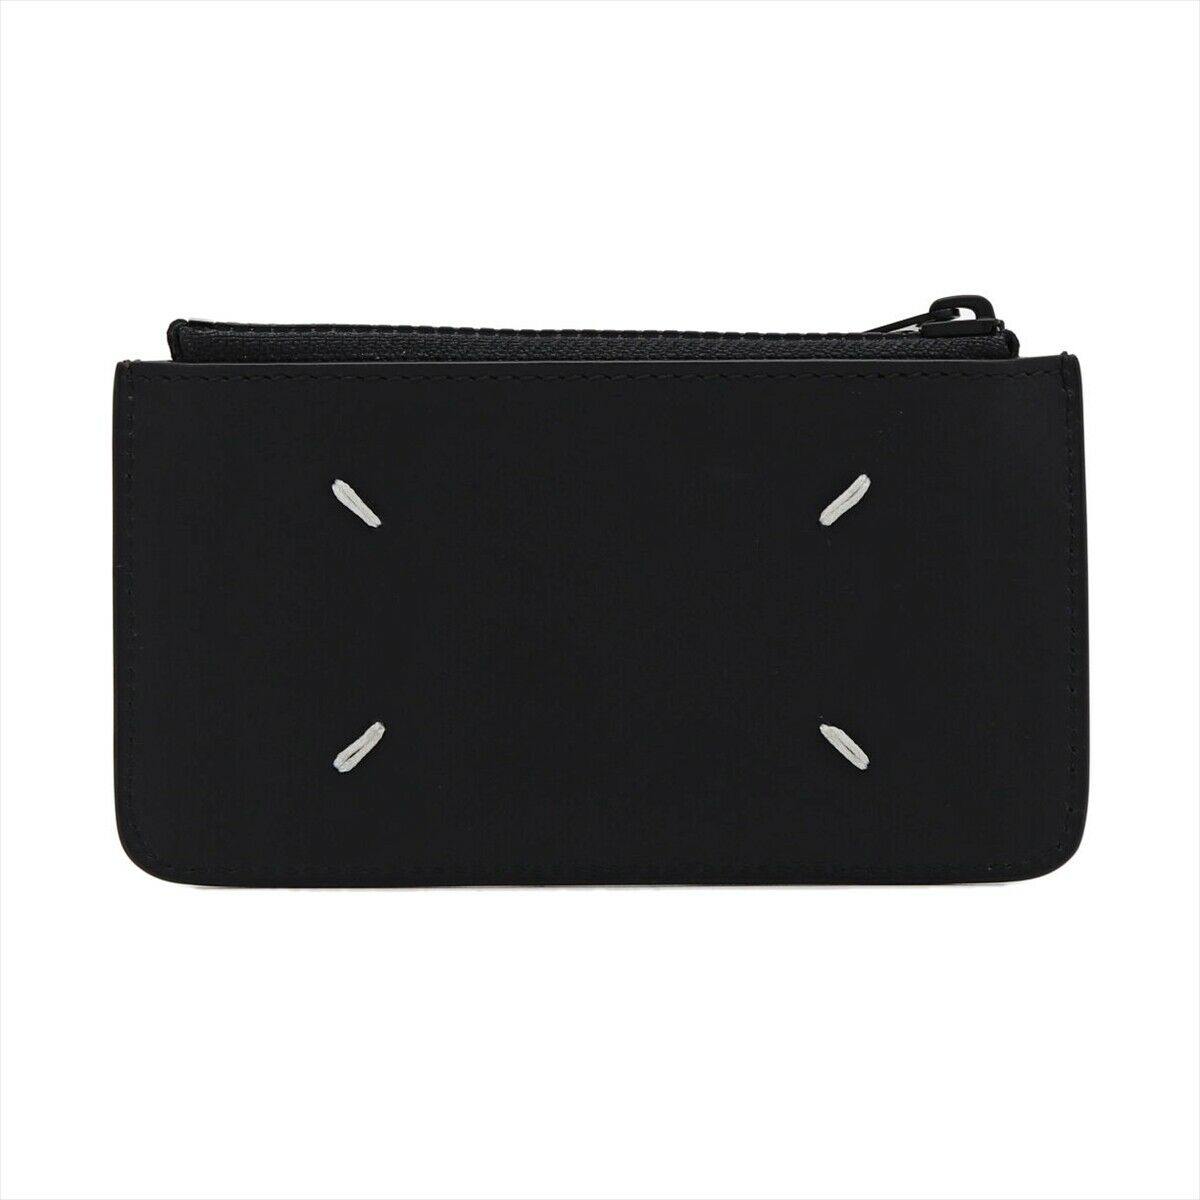 Maison Margiela S55UA0023 PS935 Leather Card Case Black New